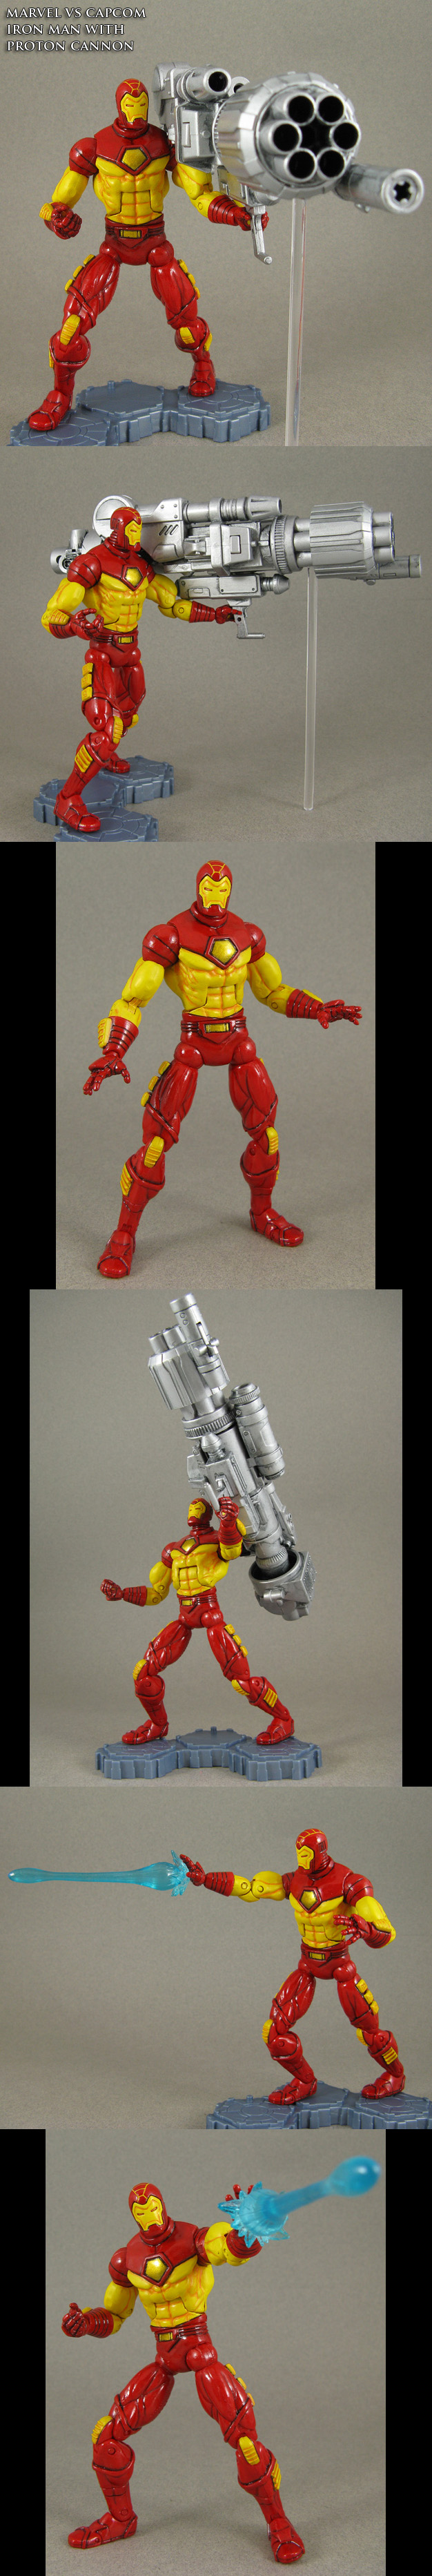 Custom Proton Cannon MvC2 Iron Man figure by Jin-Saotome